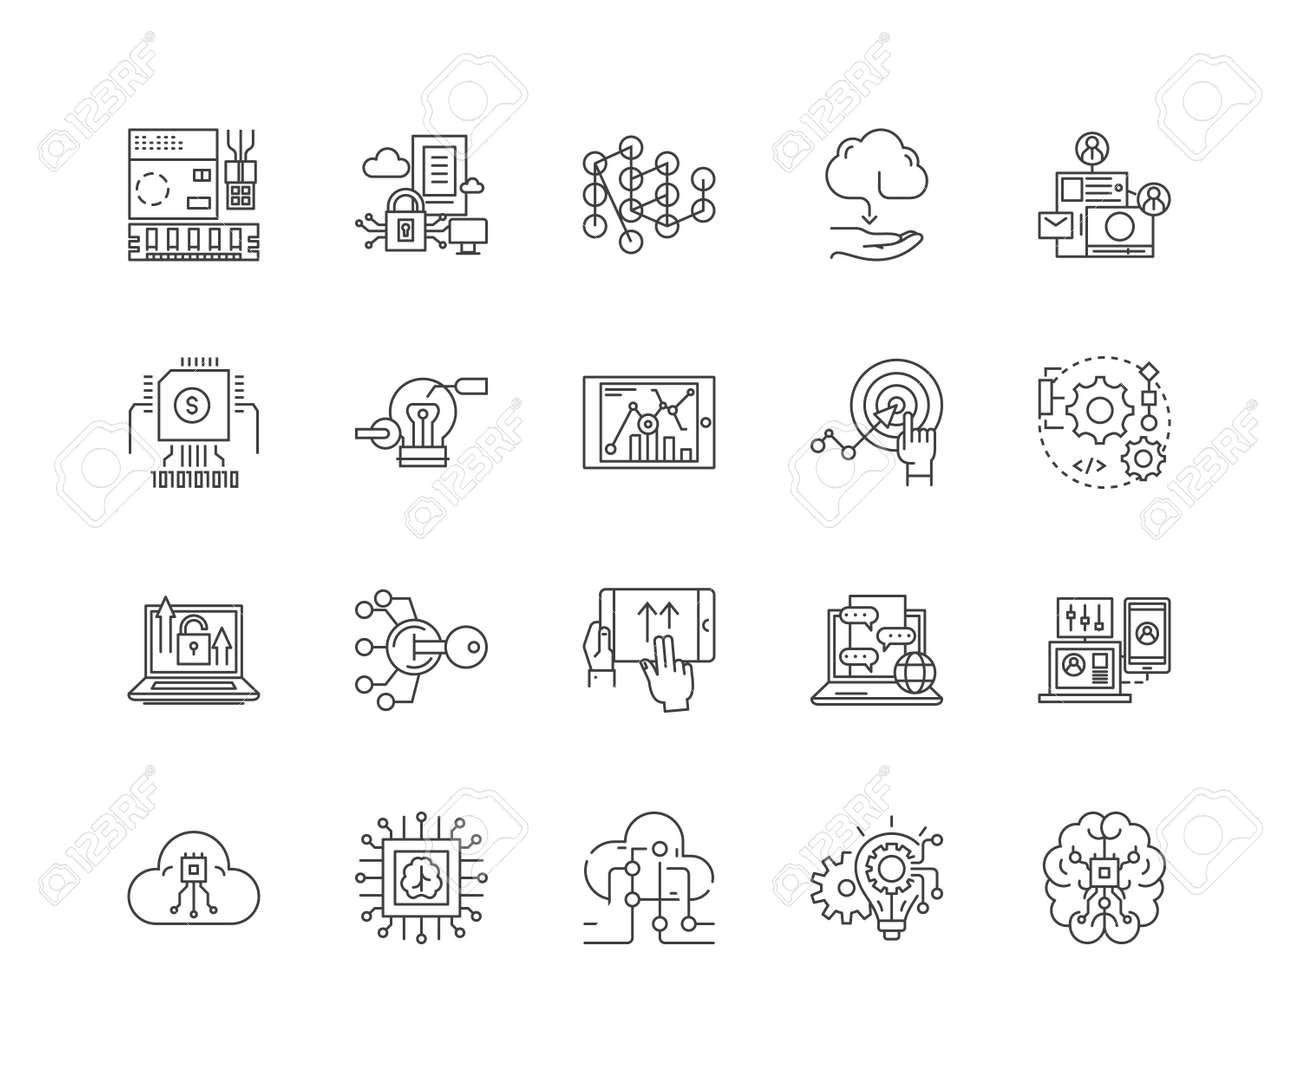 Hitech business line icons, linear signs, vector set, outline concept illustration - 122338598